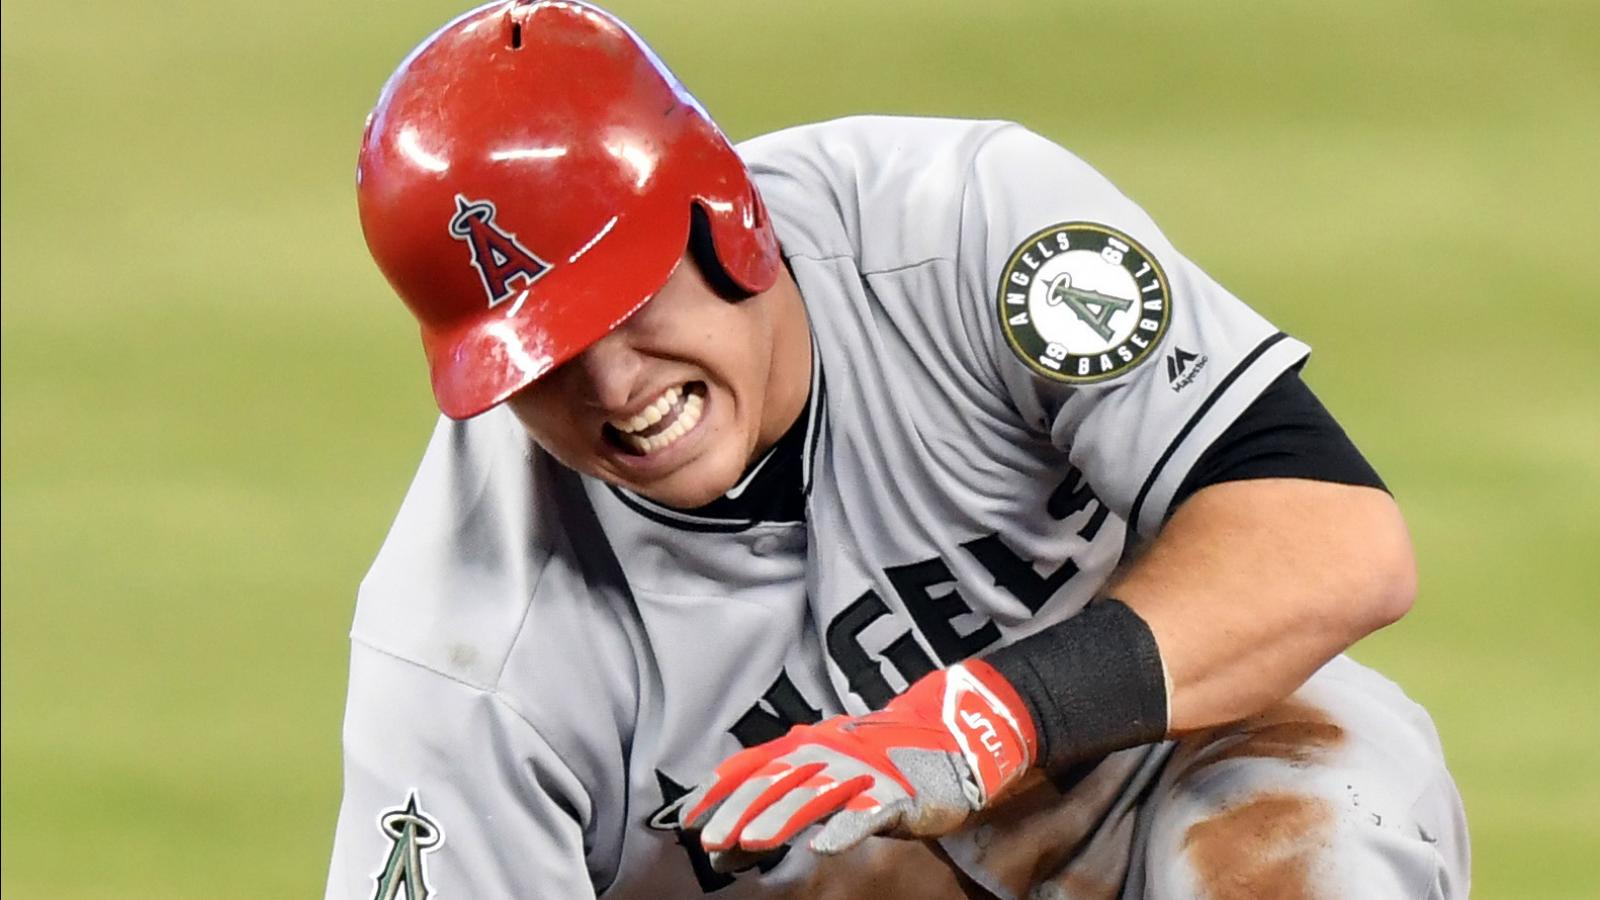 053017-MLB-MikeTrout-PI